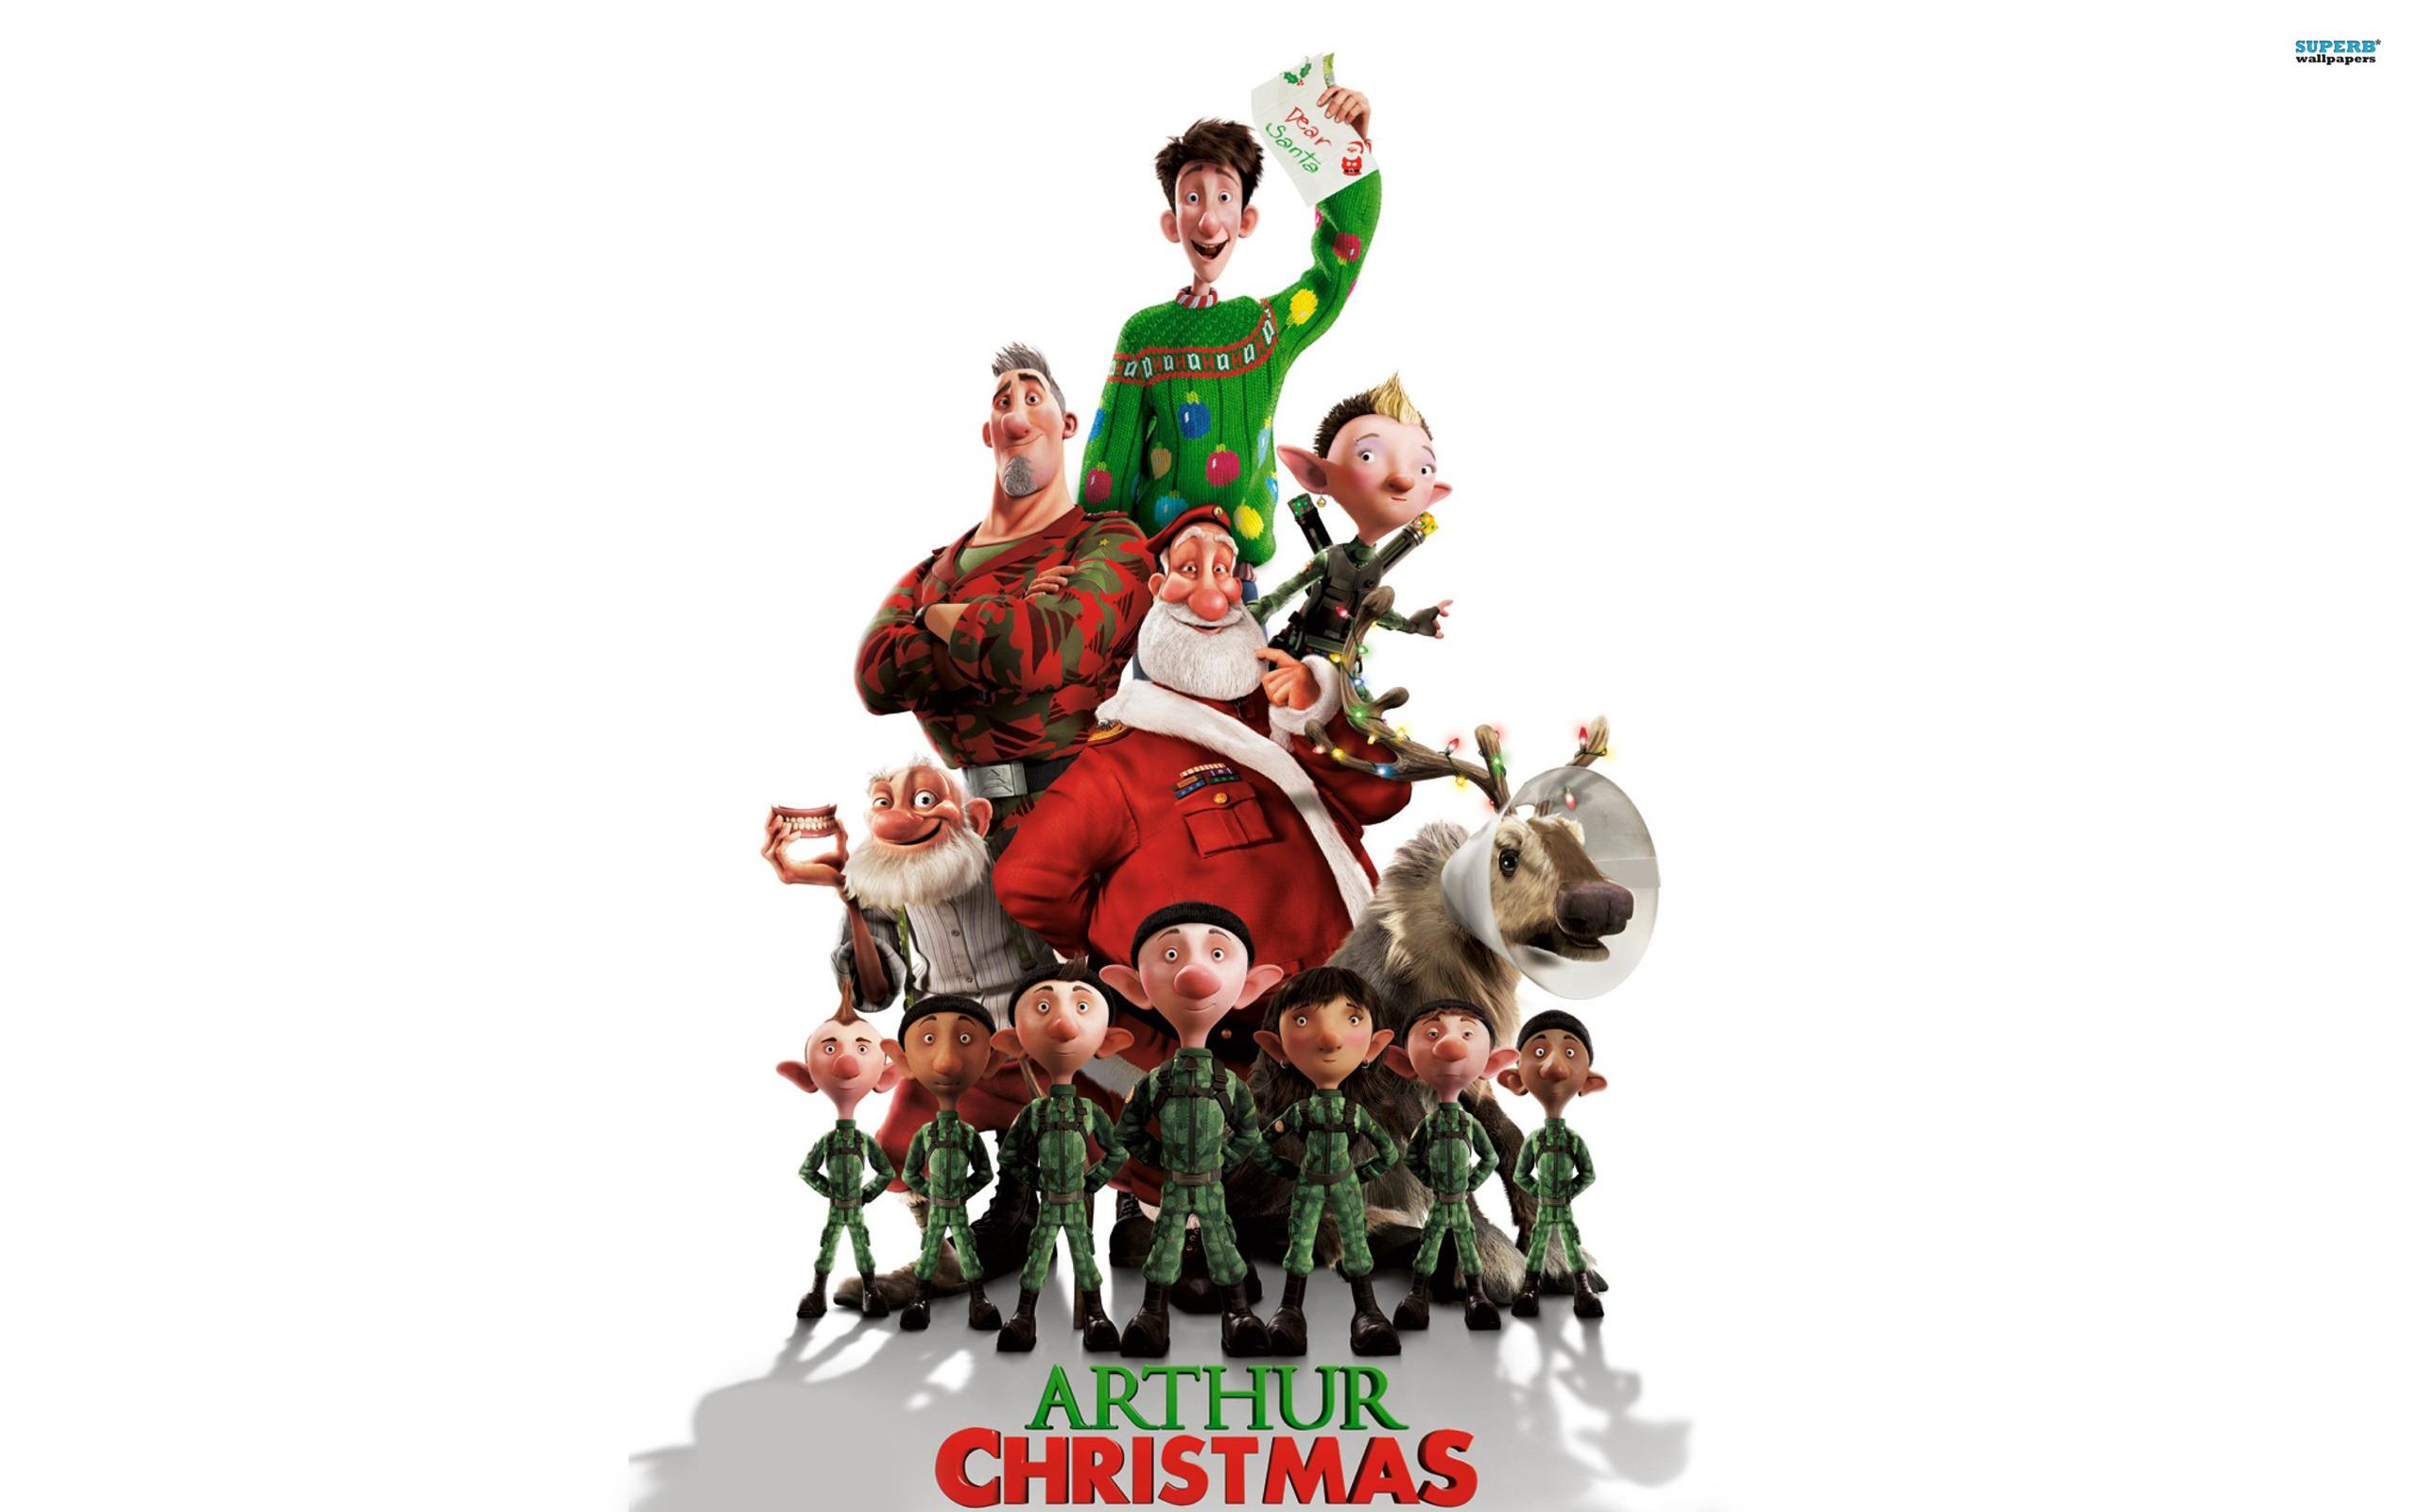 Best 46 Arthur Christmas Wallpaper on HipWallpaper Christmas 2560x1600